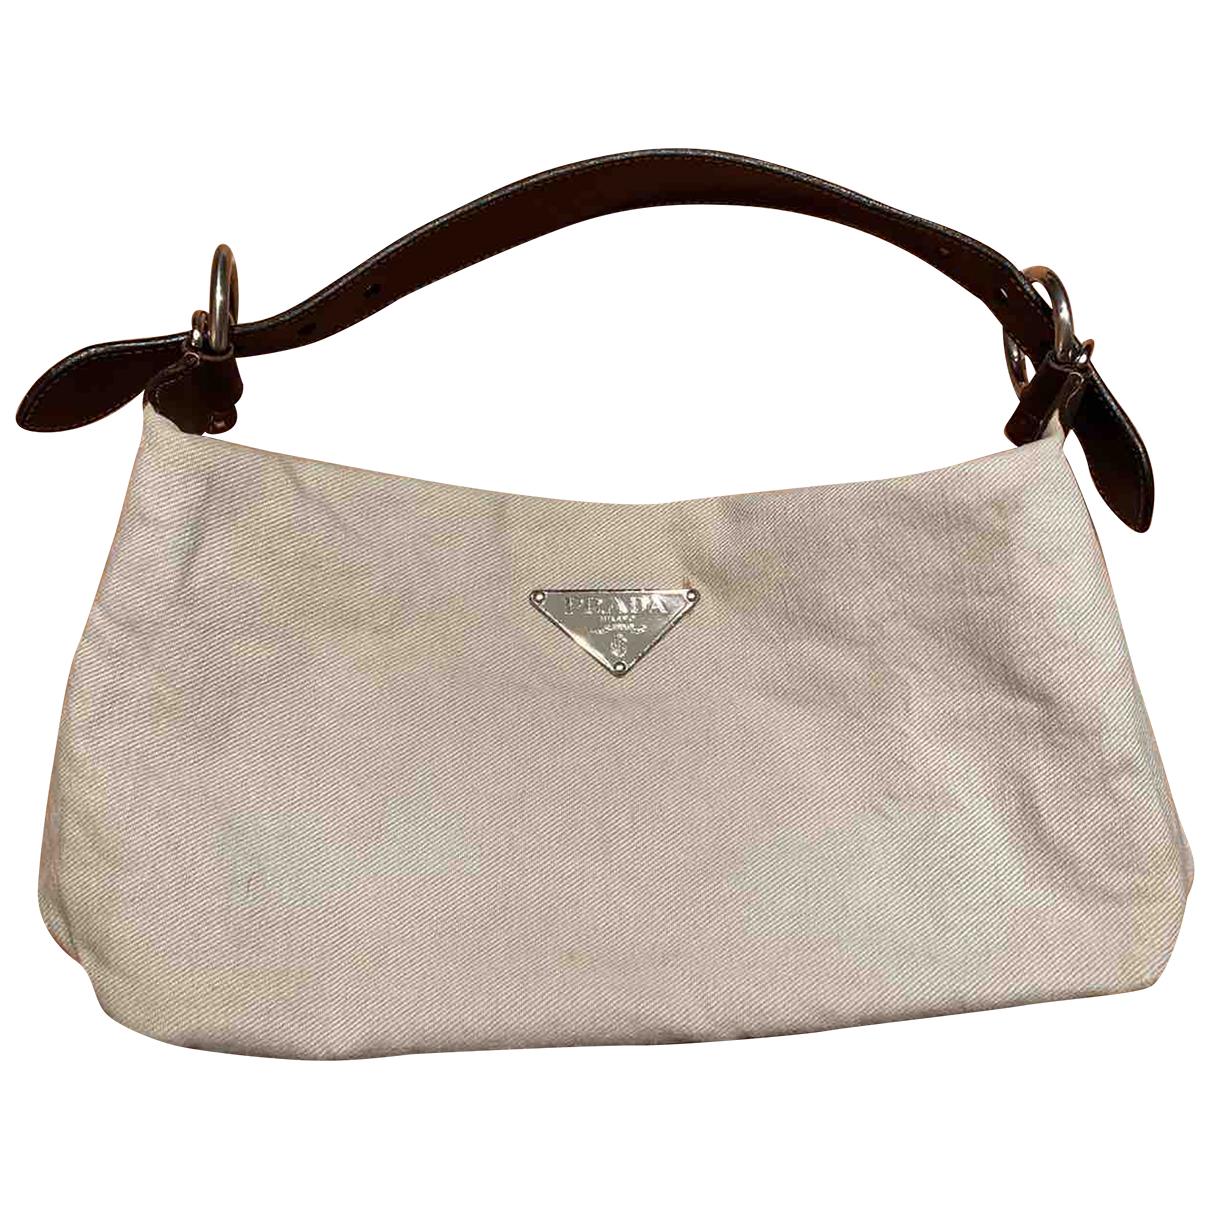 Prada - Sac a main Tessuto  pour femme en coton - blanc